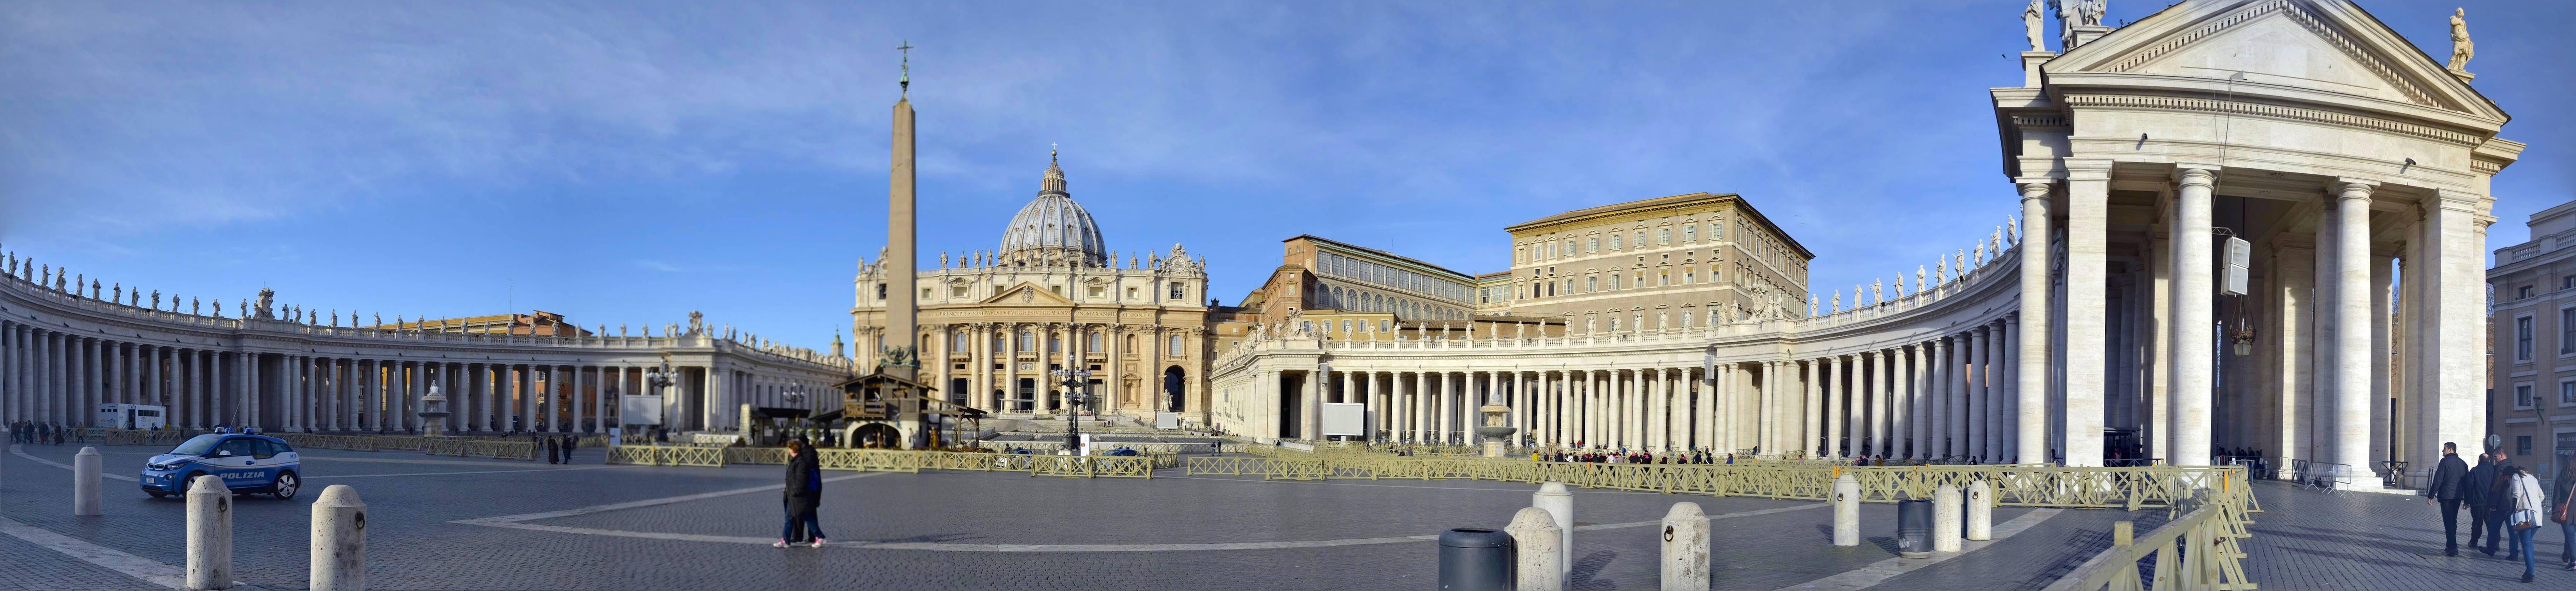 Vaticano, Vaticani, Vatican, Roma, Italia, Italy, Piazza San Pietro, Praça São pedro, Baisilica di San Pietro, Basílica de São Pedro, Bernini